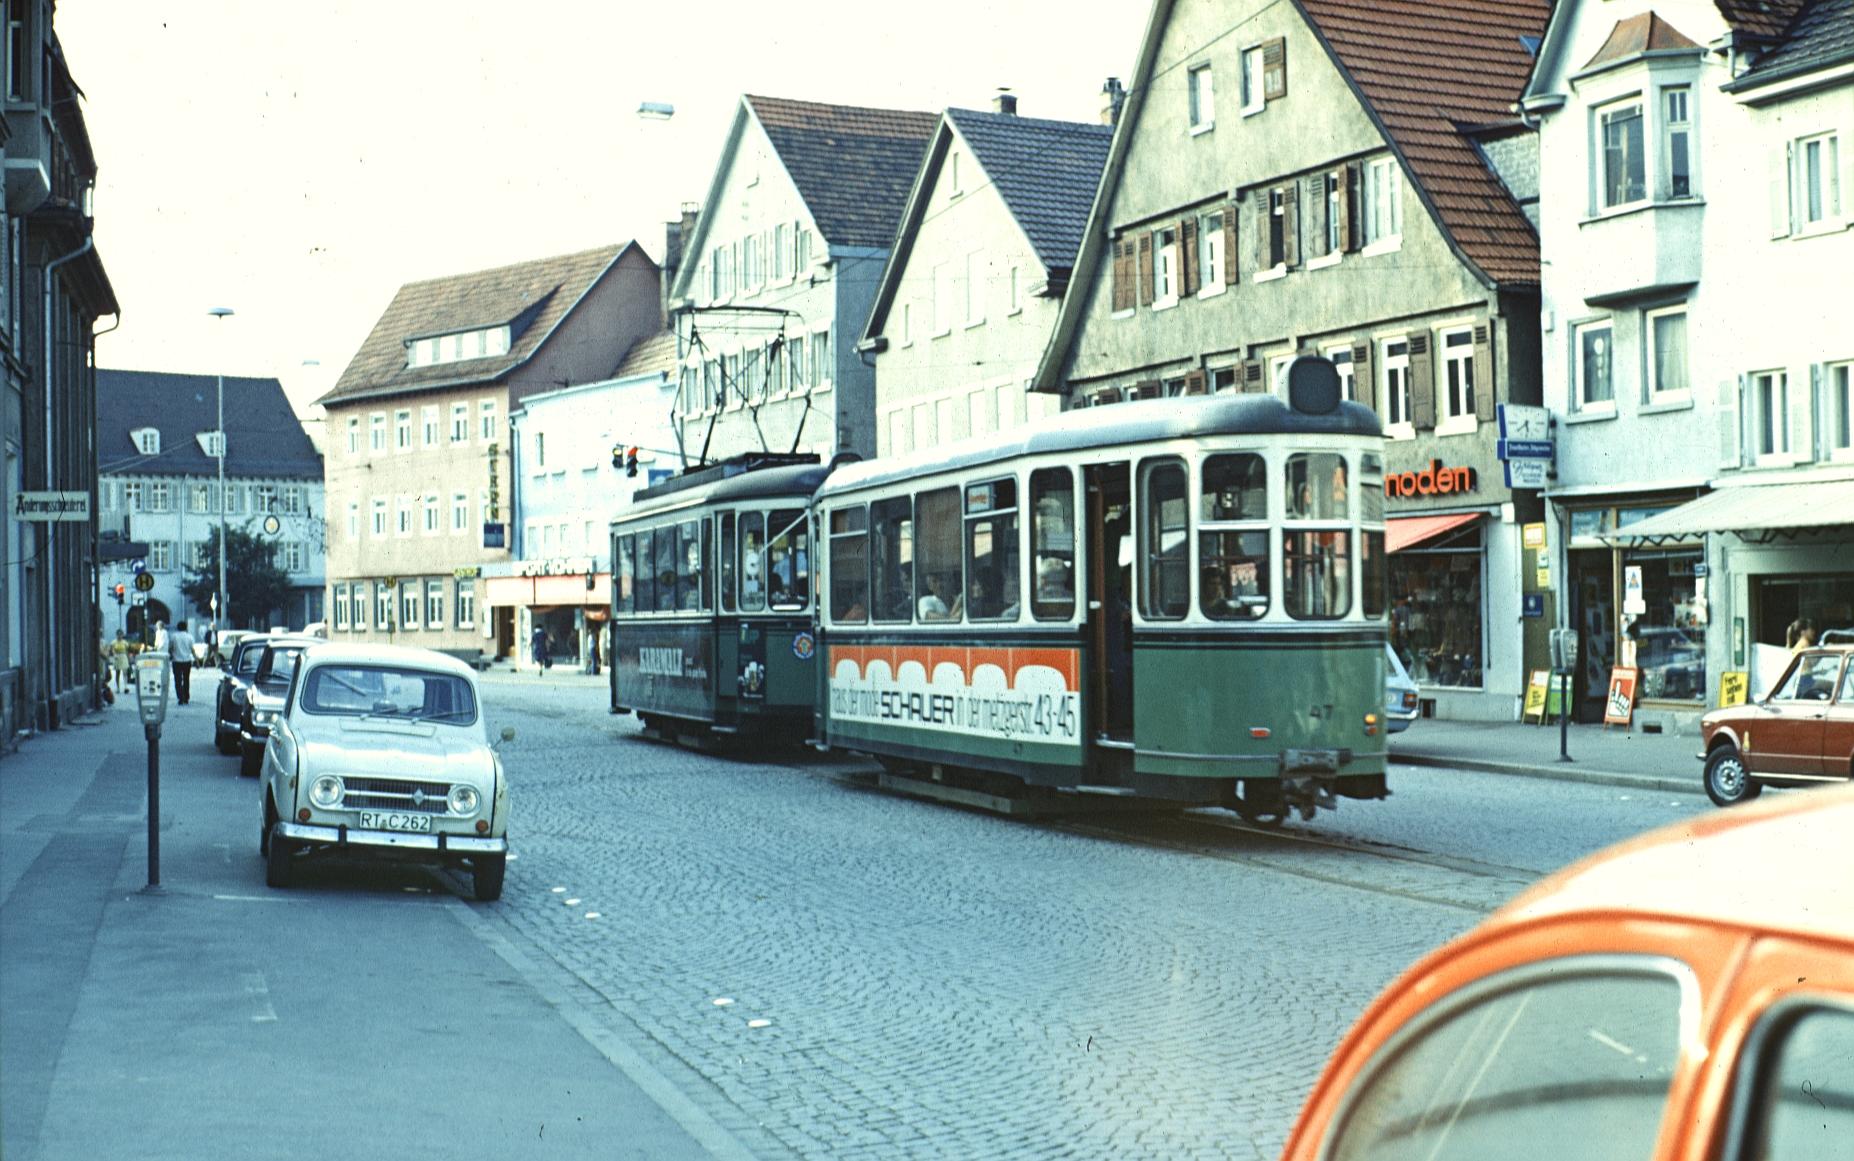 http://www.wiesloch-kurpfalz.de/Strassenbahn/Bilder/normal/Reutlingen/74x218.jpg